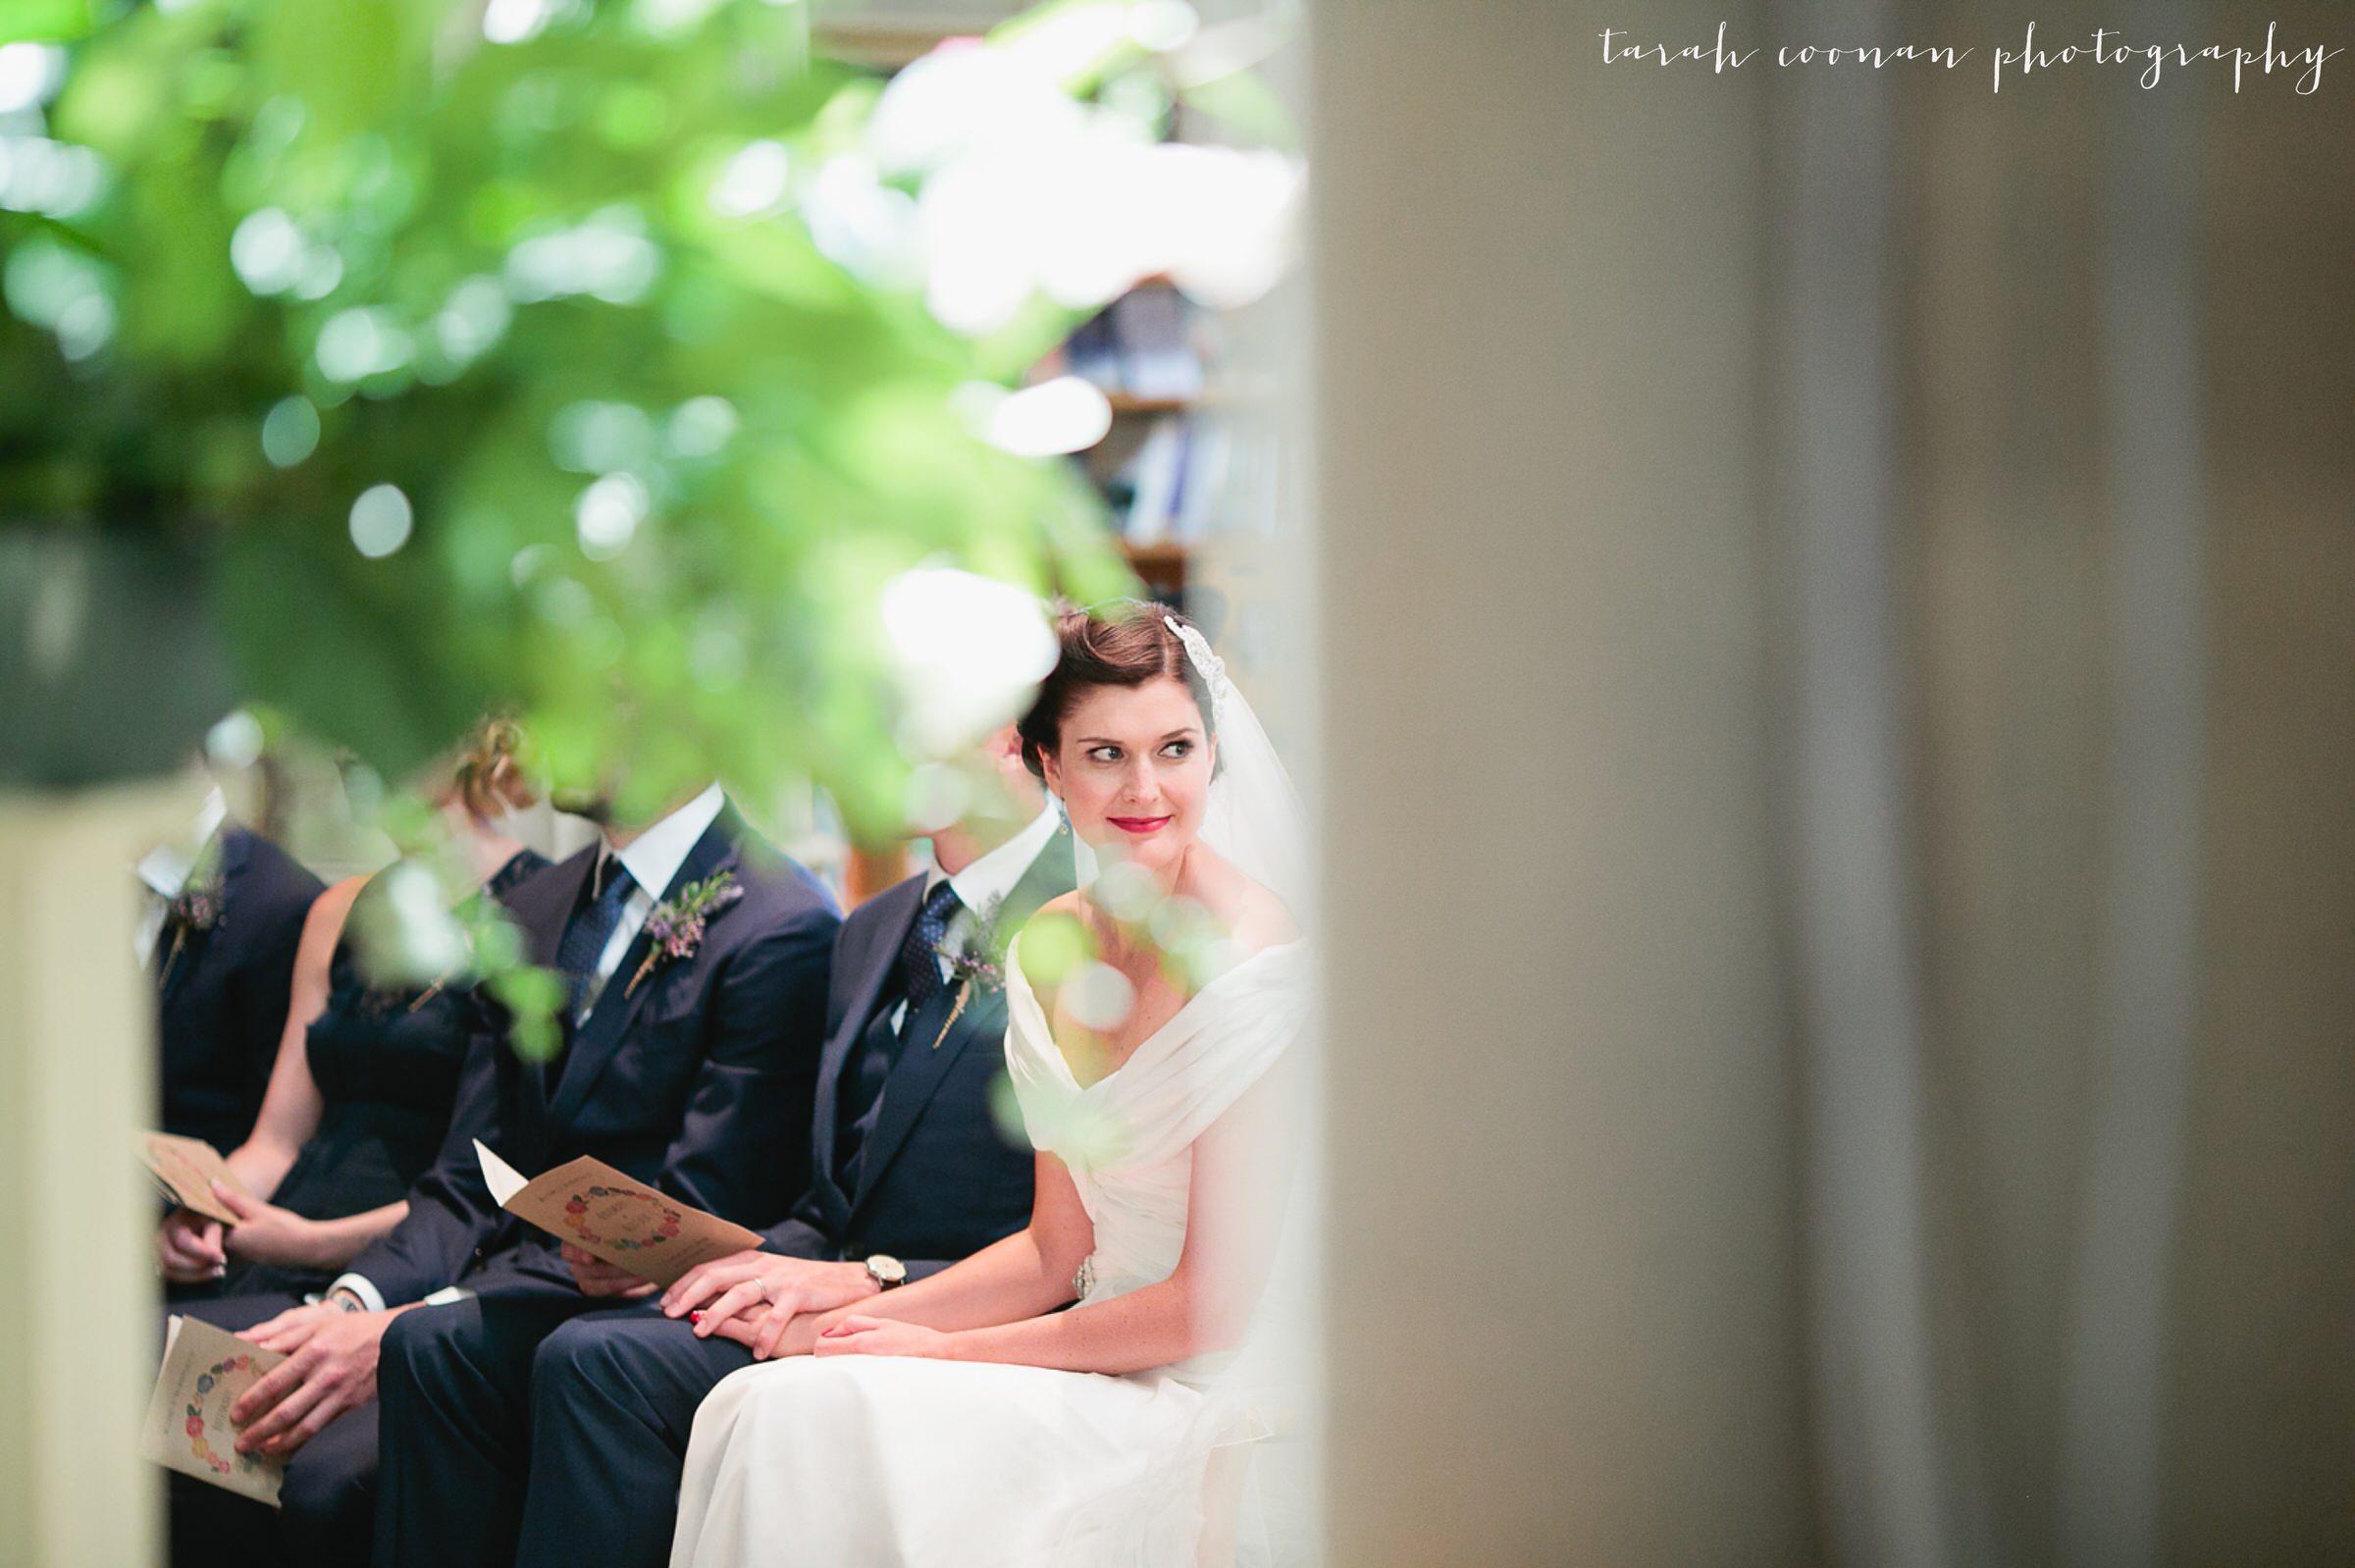 brighton-wedding-photographer23